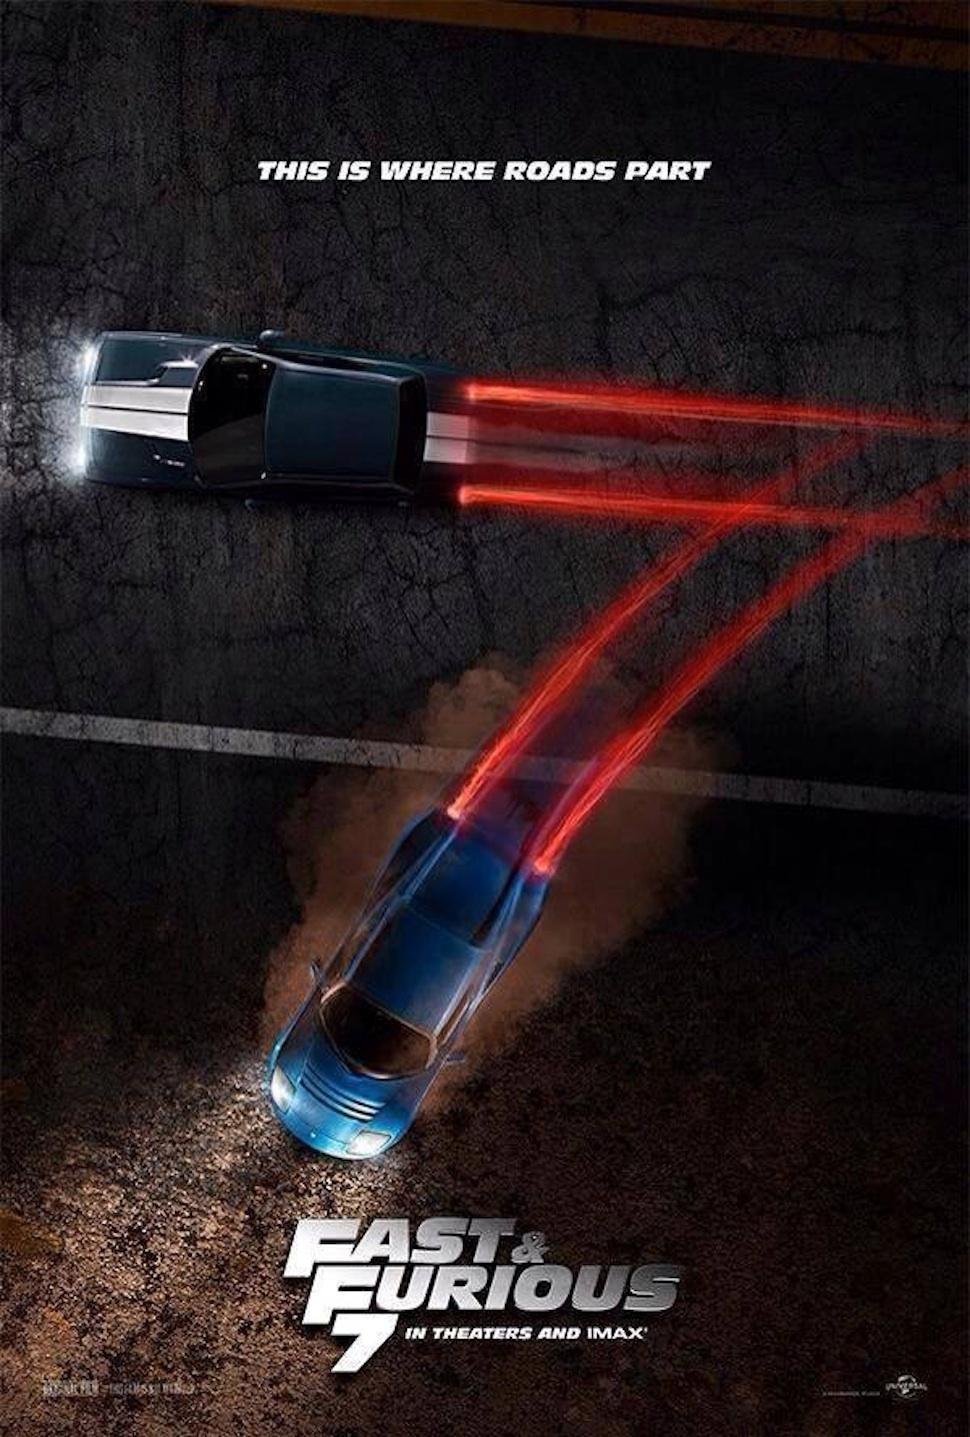 Fast & Furious 7 DVD Release Date | NewDVDReleaseDates.com